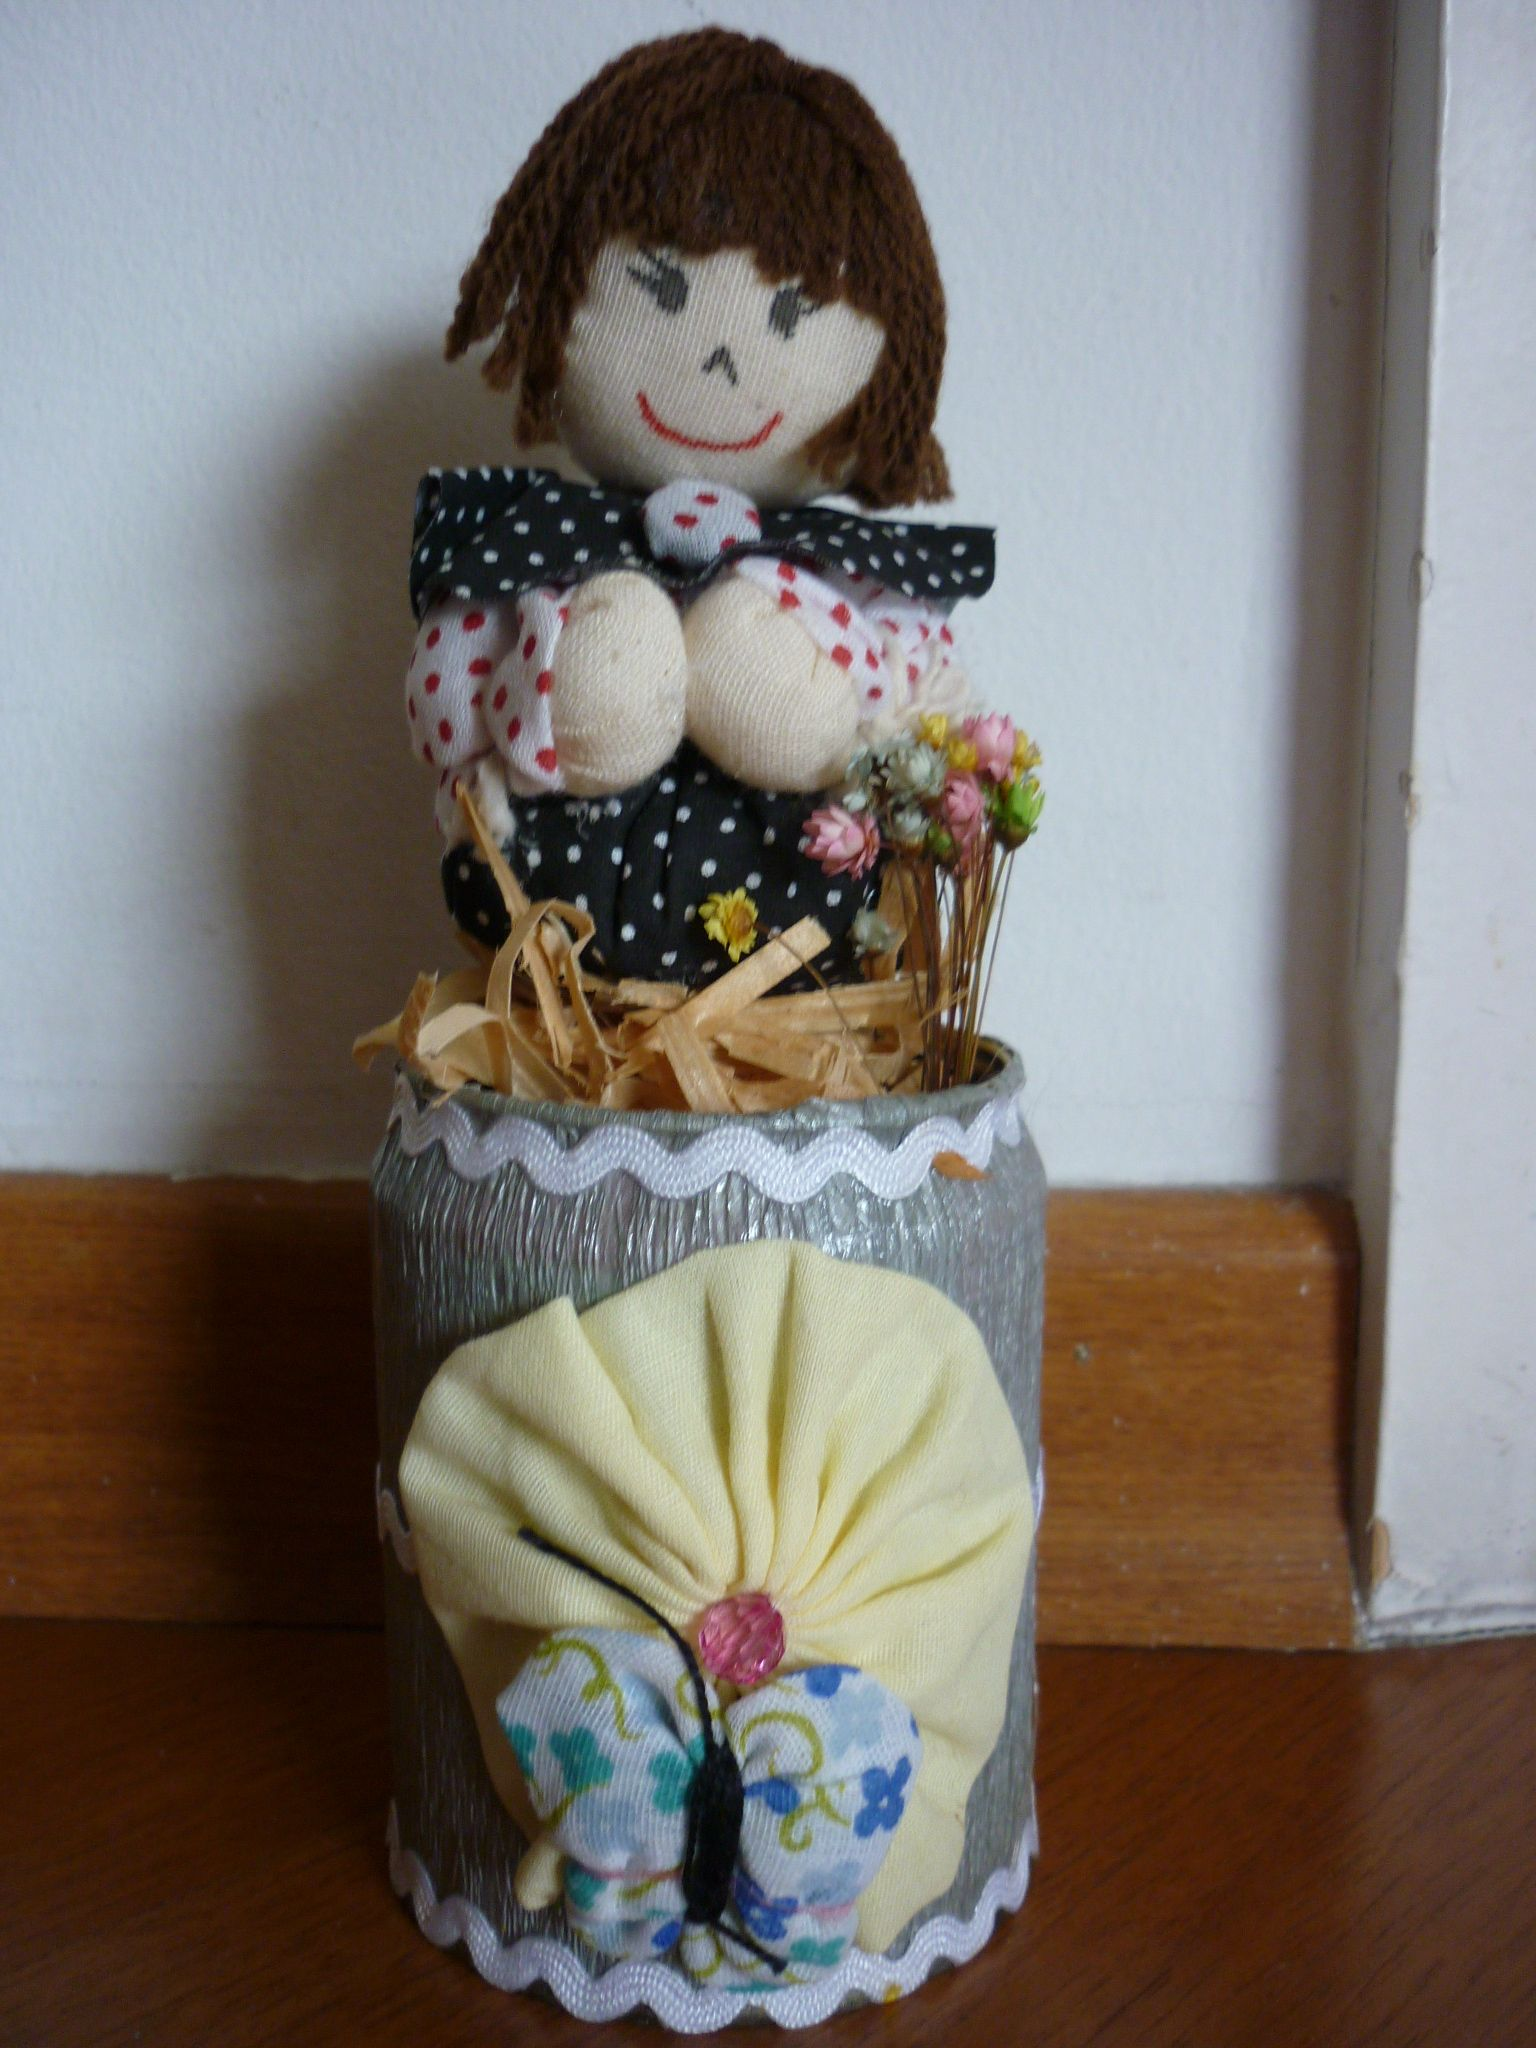 Boneca em fuxico na lata